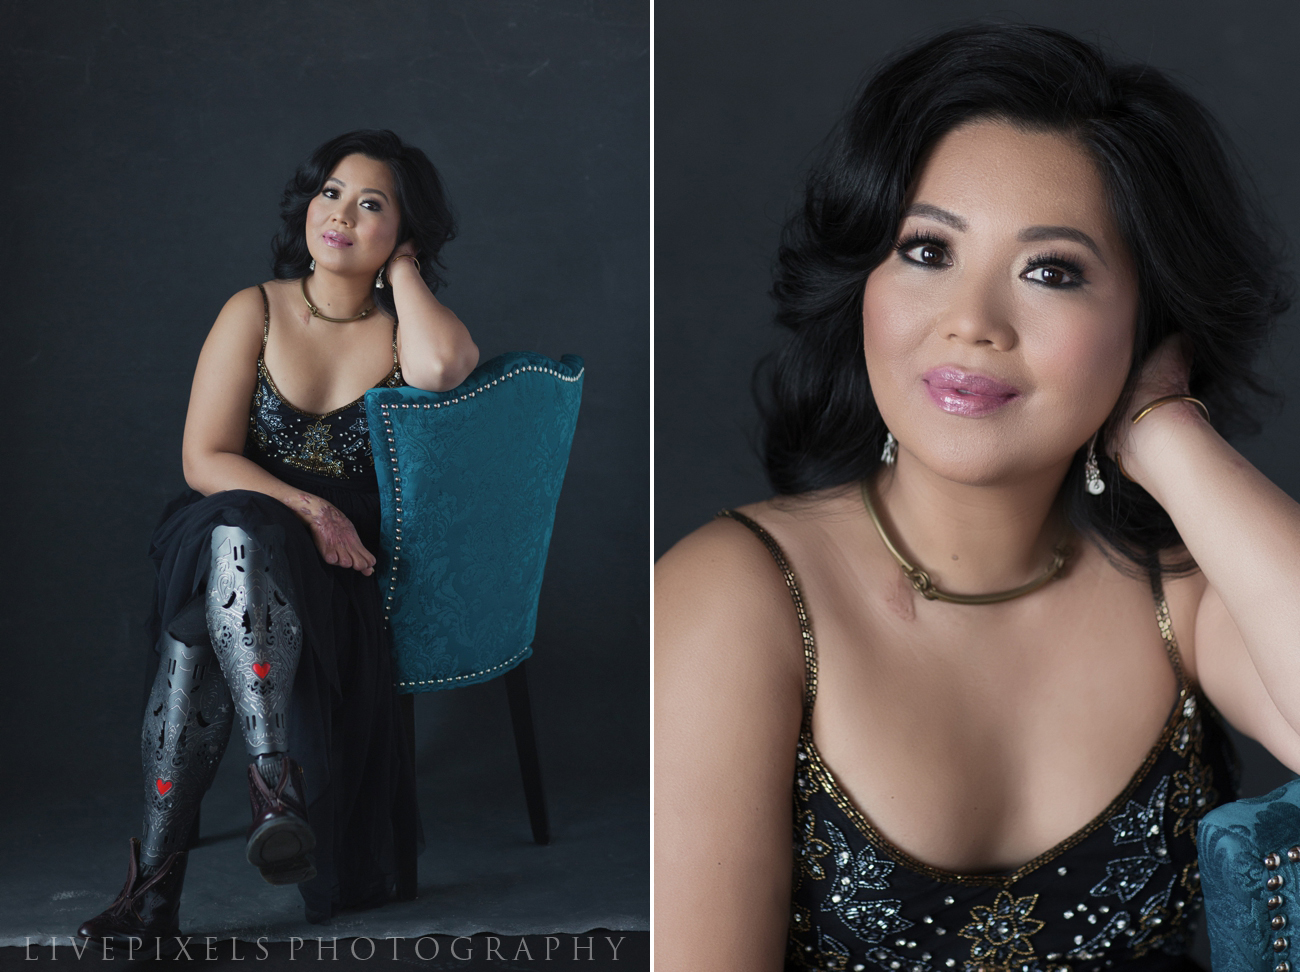 beauty-portrait-empowering-photoshoot.jpg